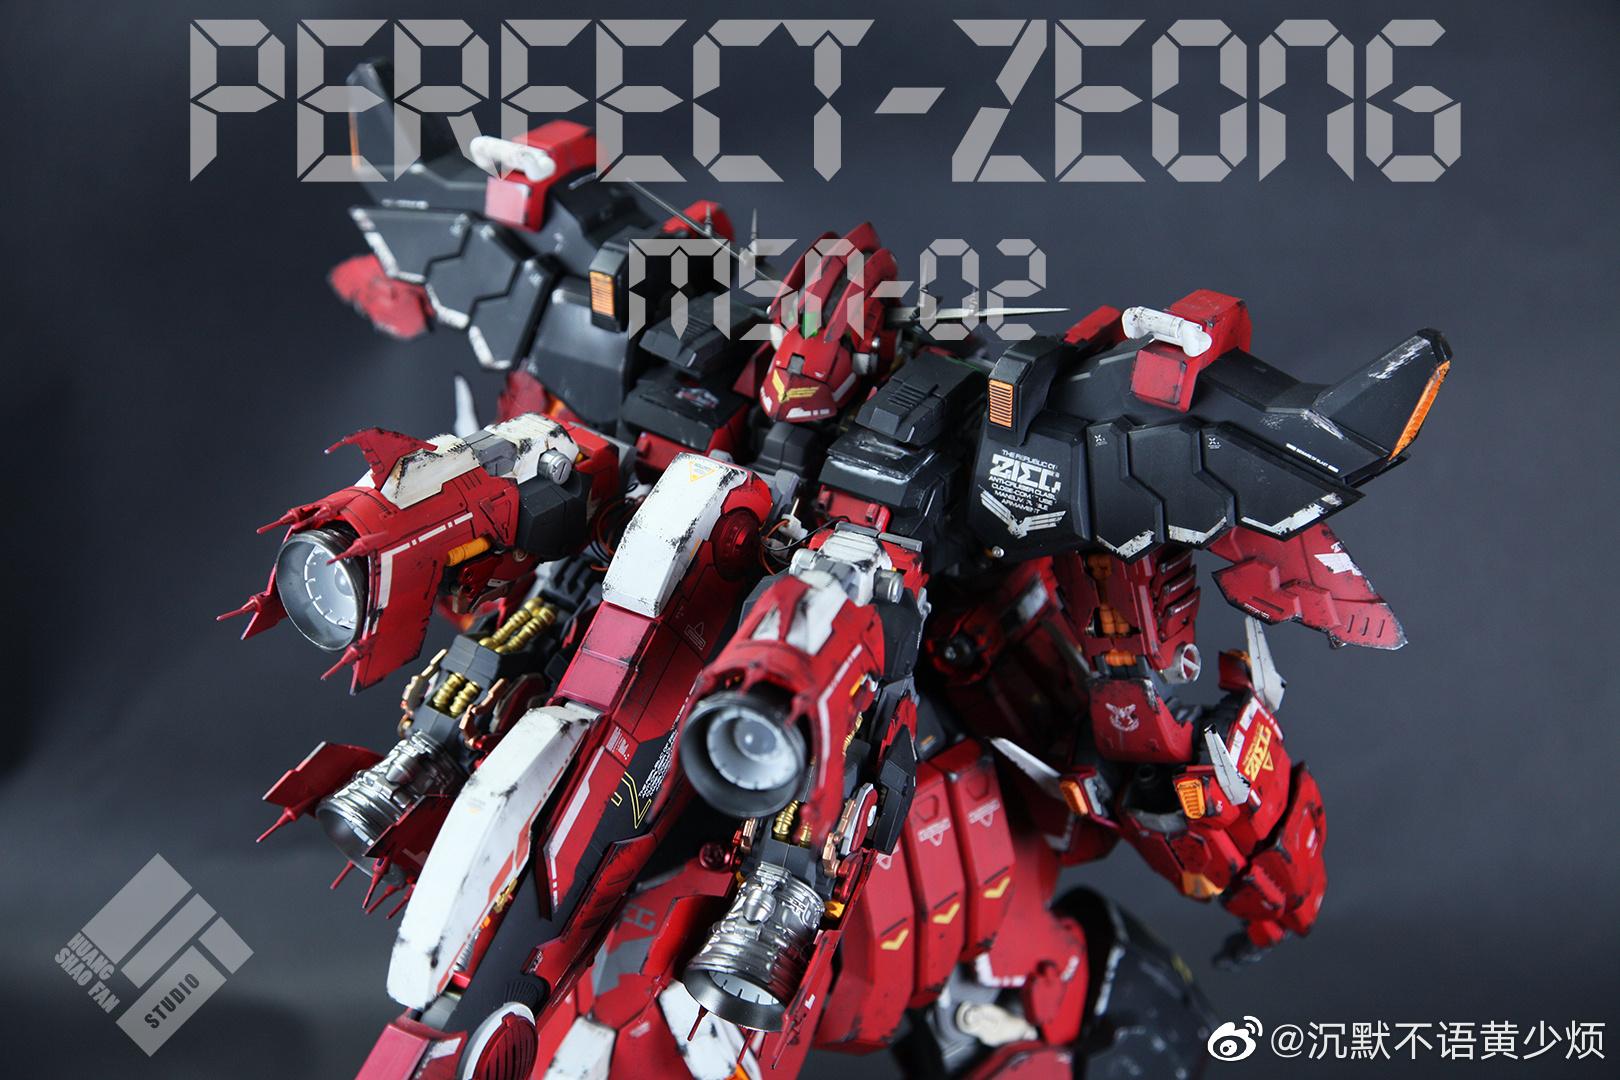 S164_2_mc_perfect_zeong_red_006.jpg